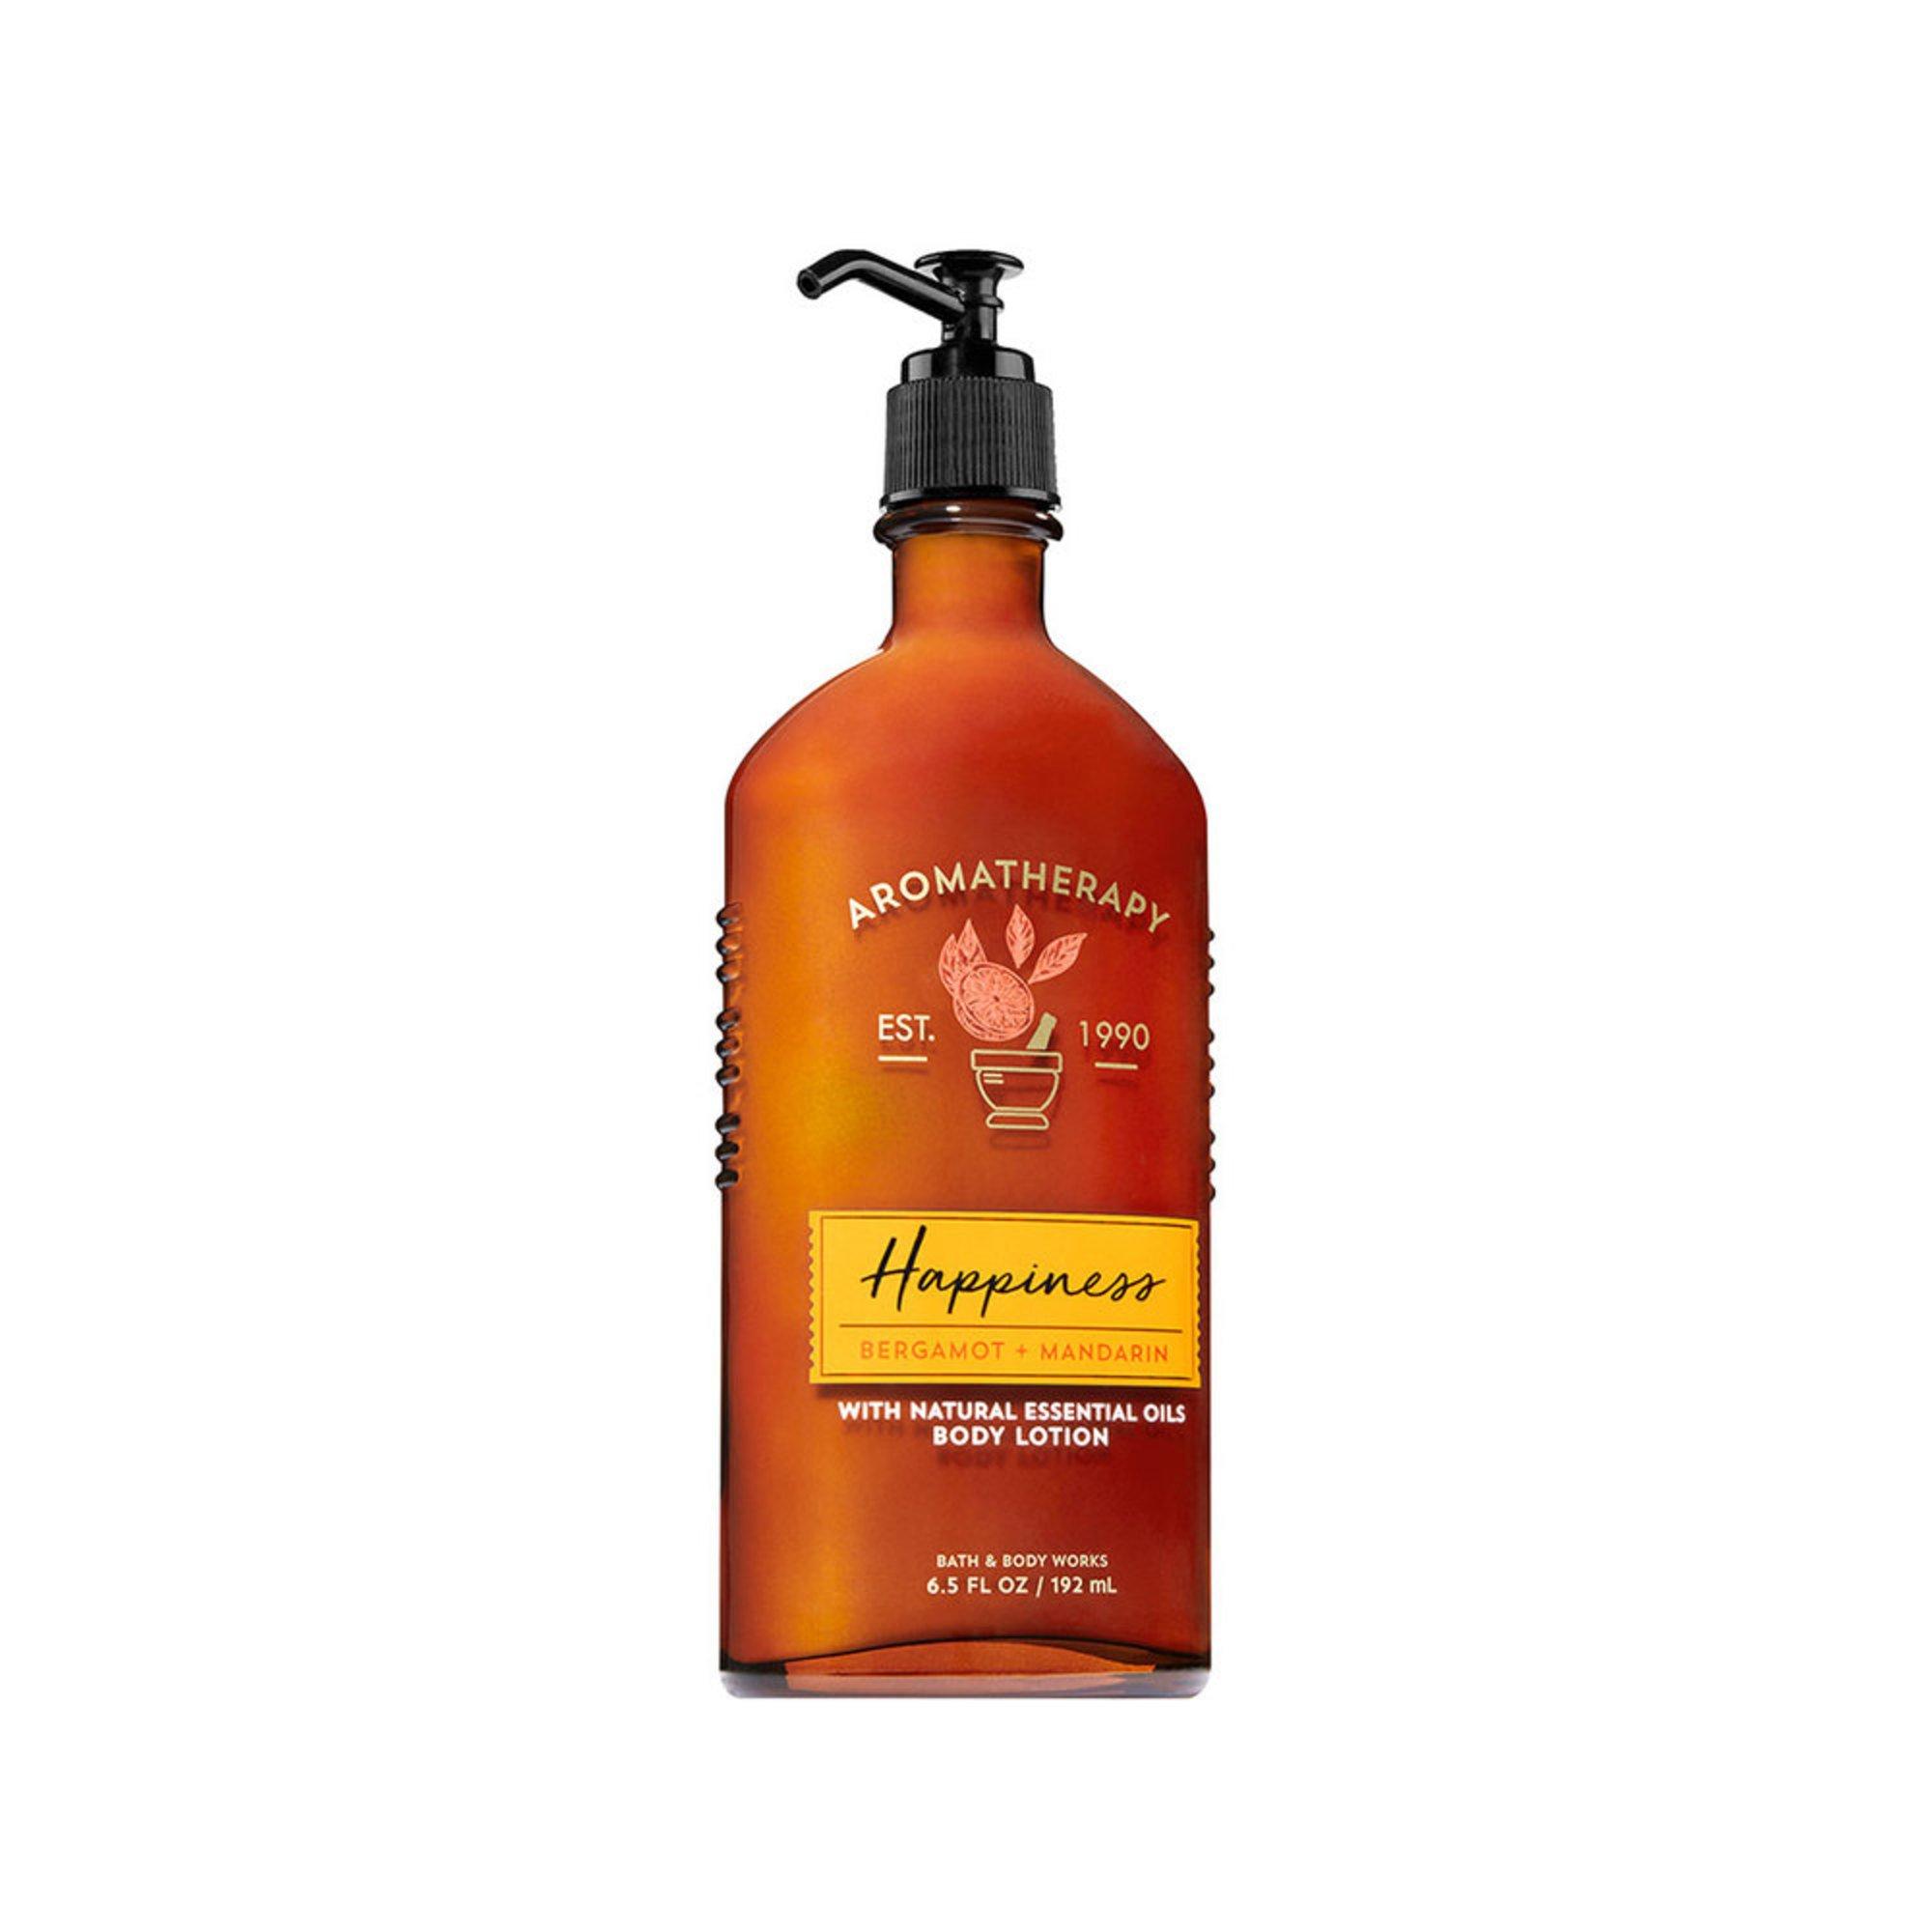 7ad2b68b97 Bath & Body Works Aromatherapy Happiness - Bergamot & Mandarin Body ...